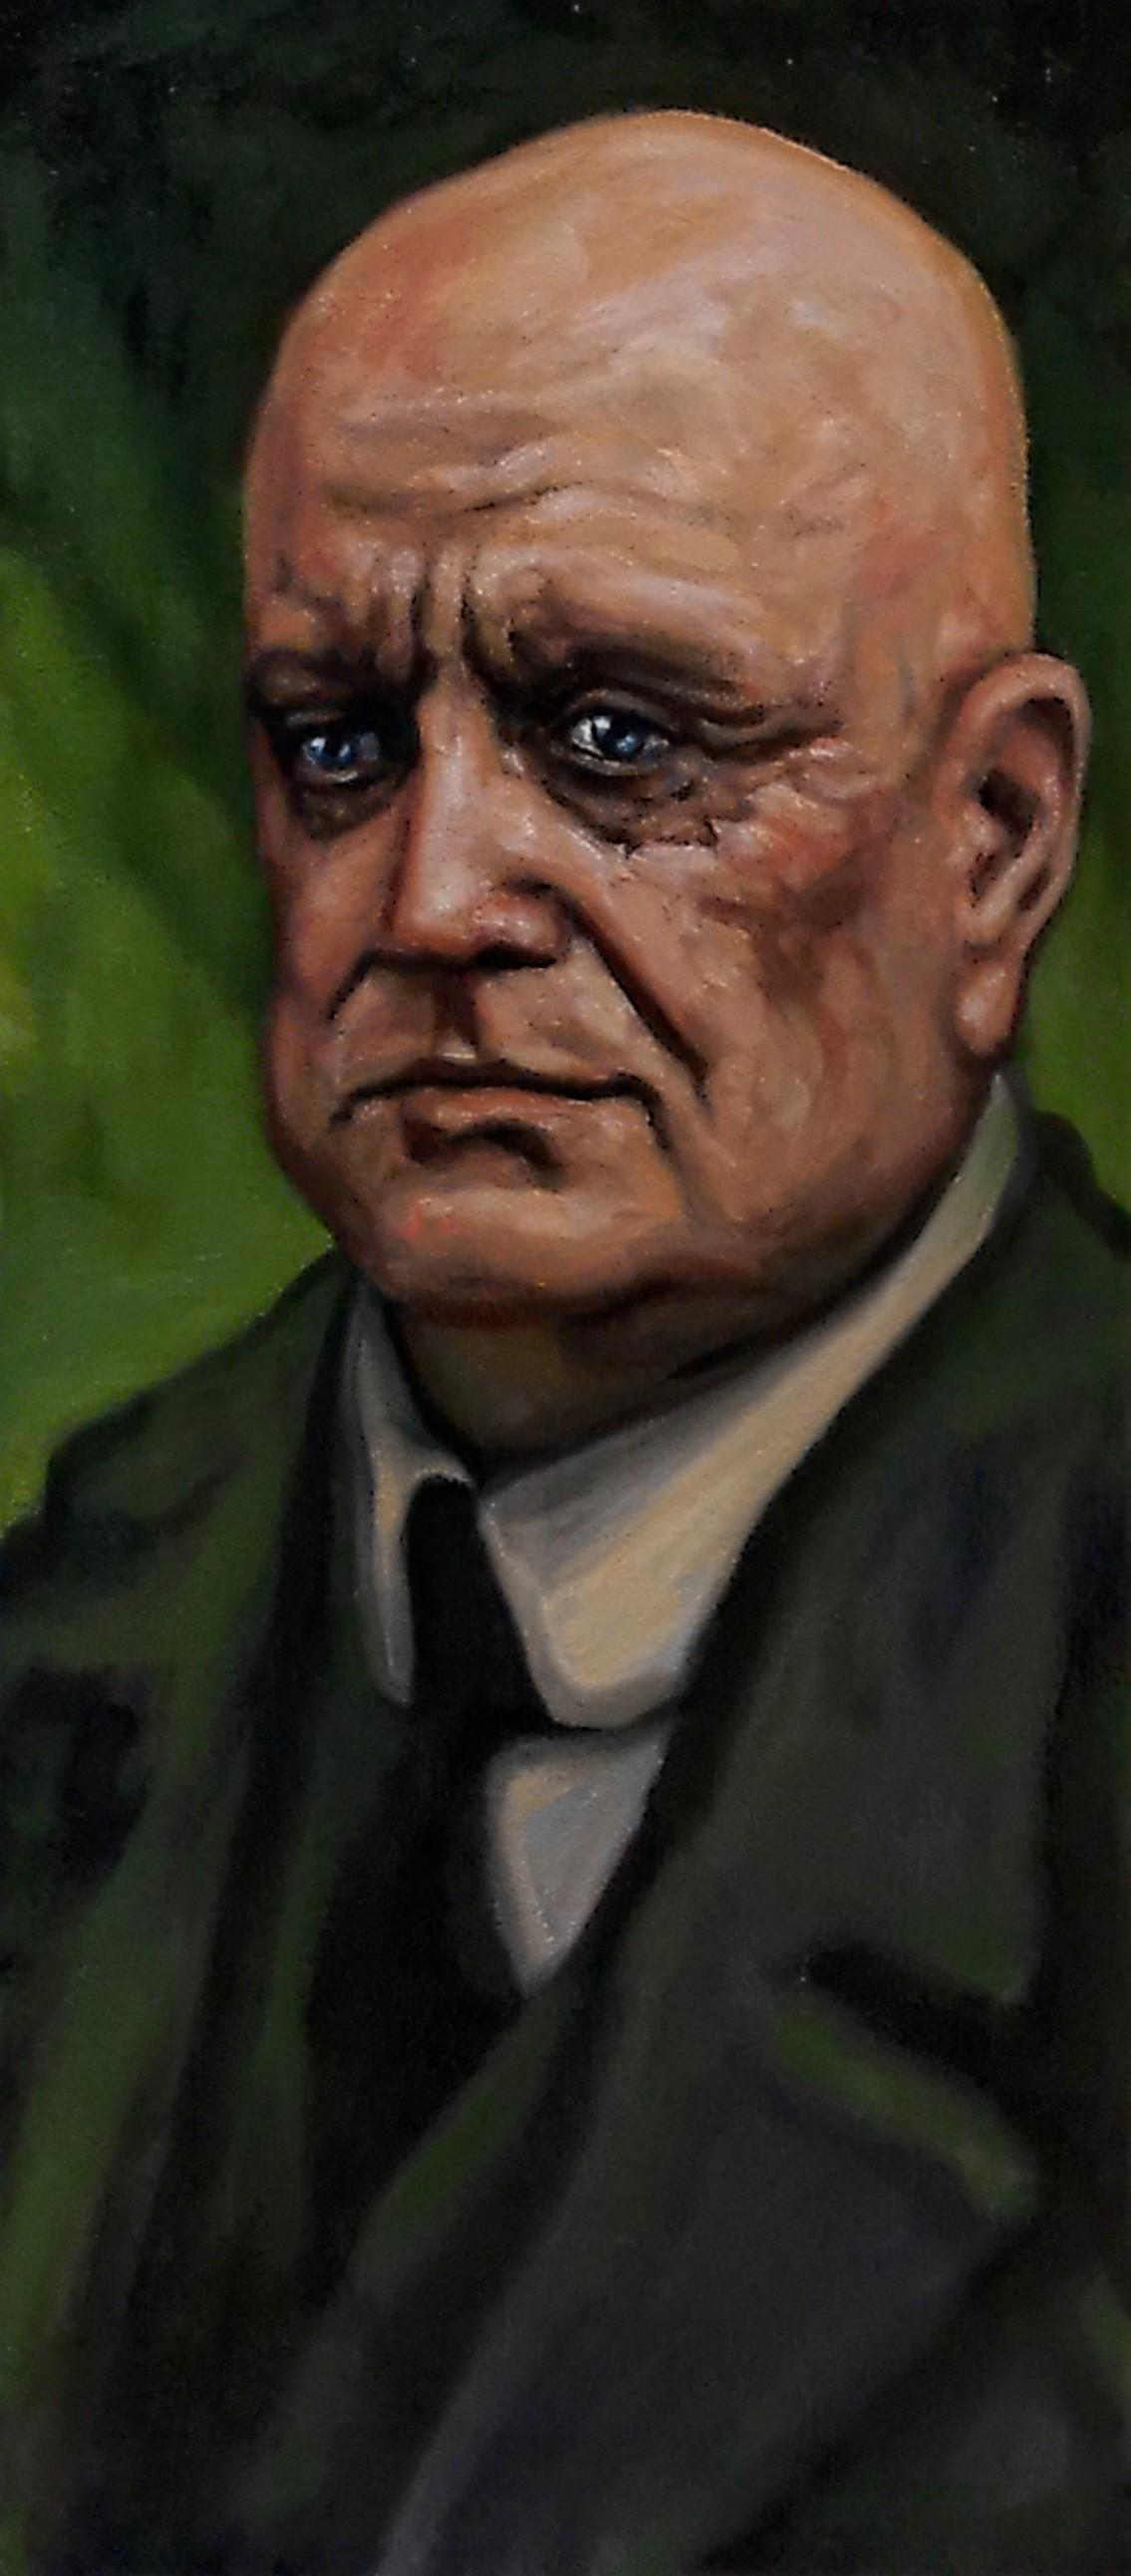 Sibelius, 2020